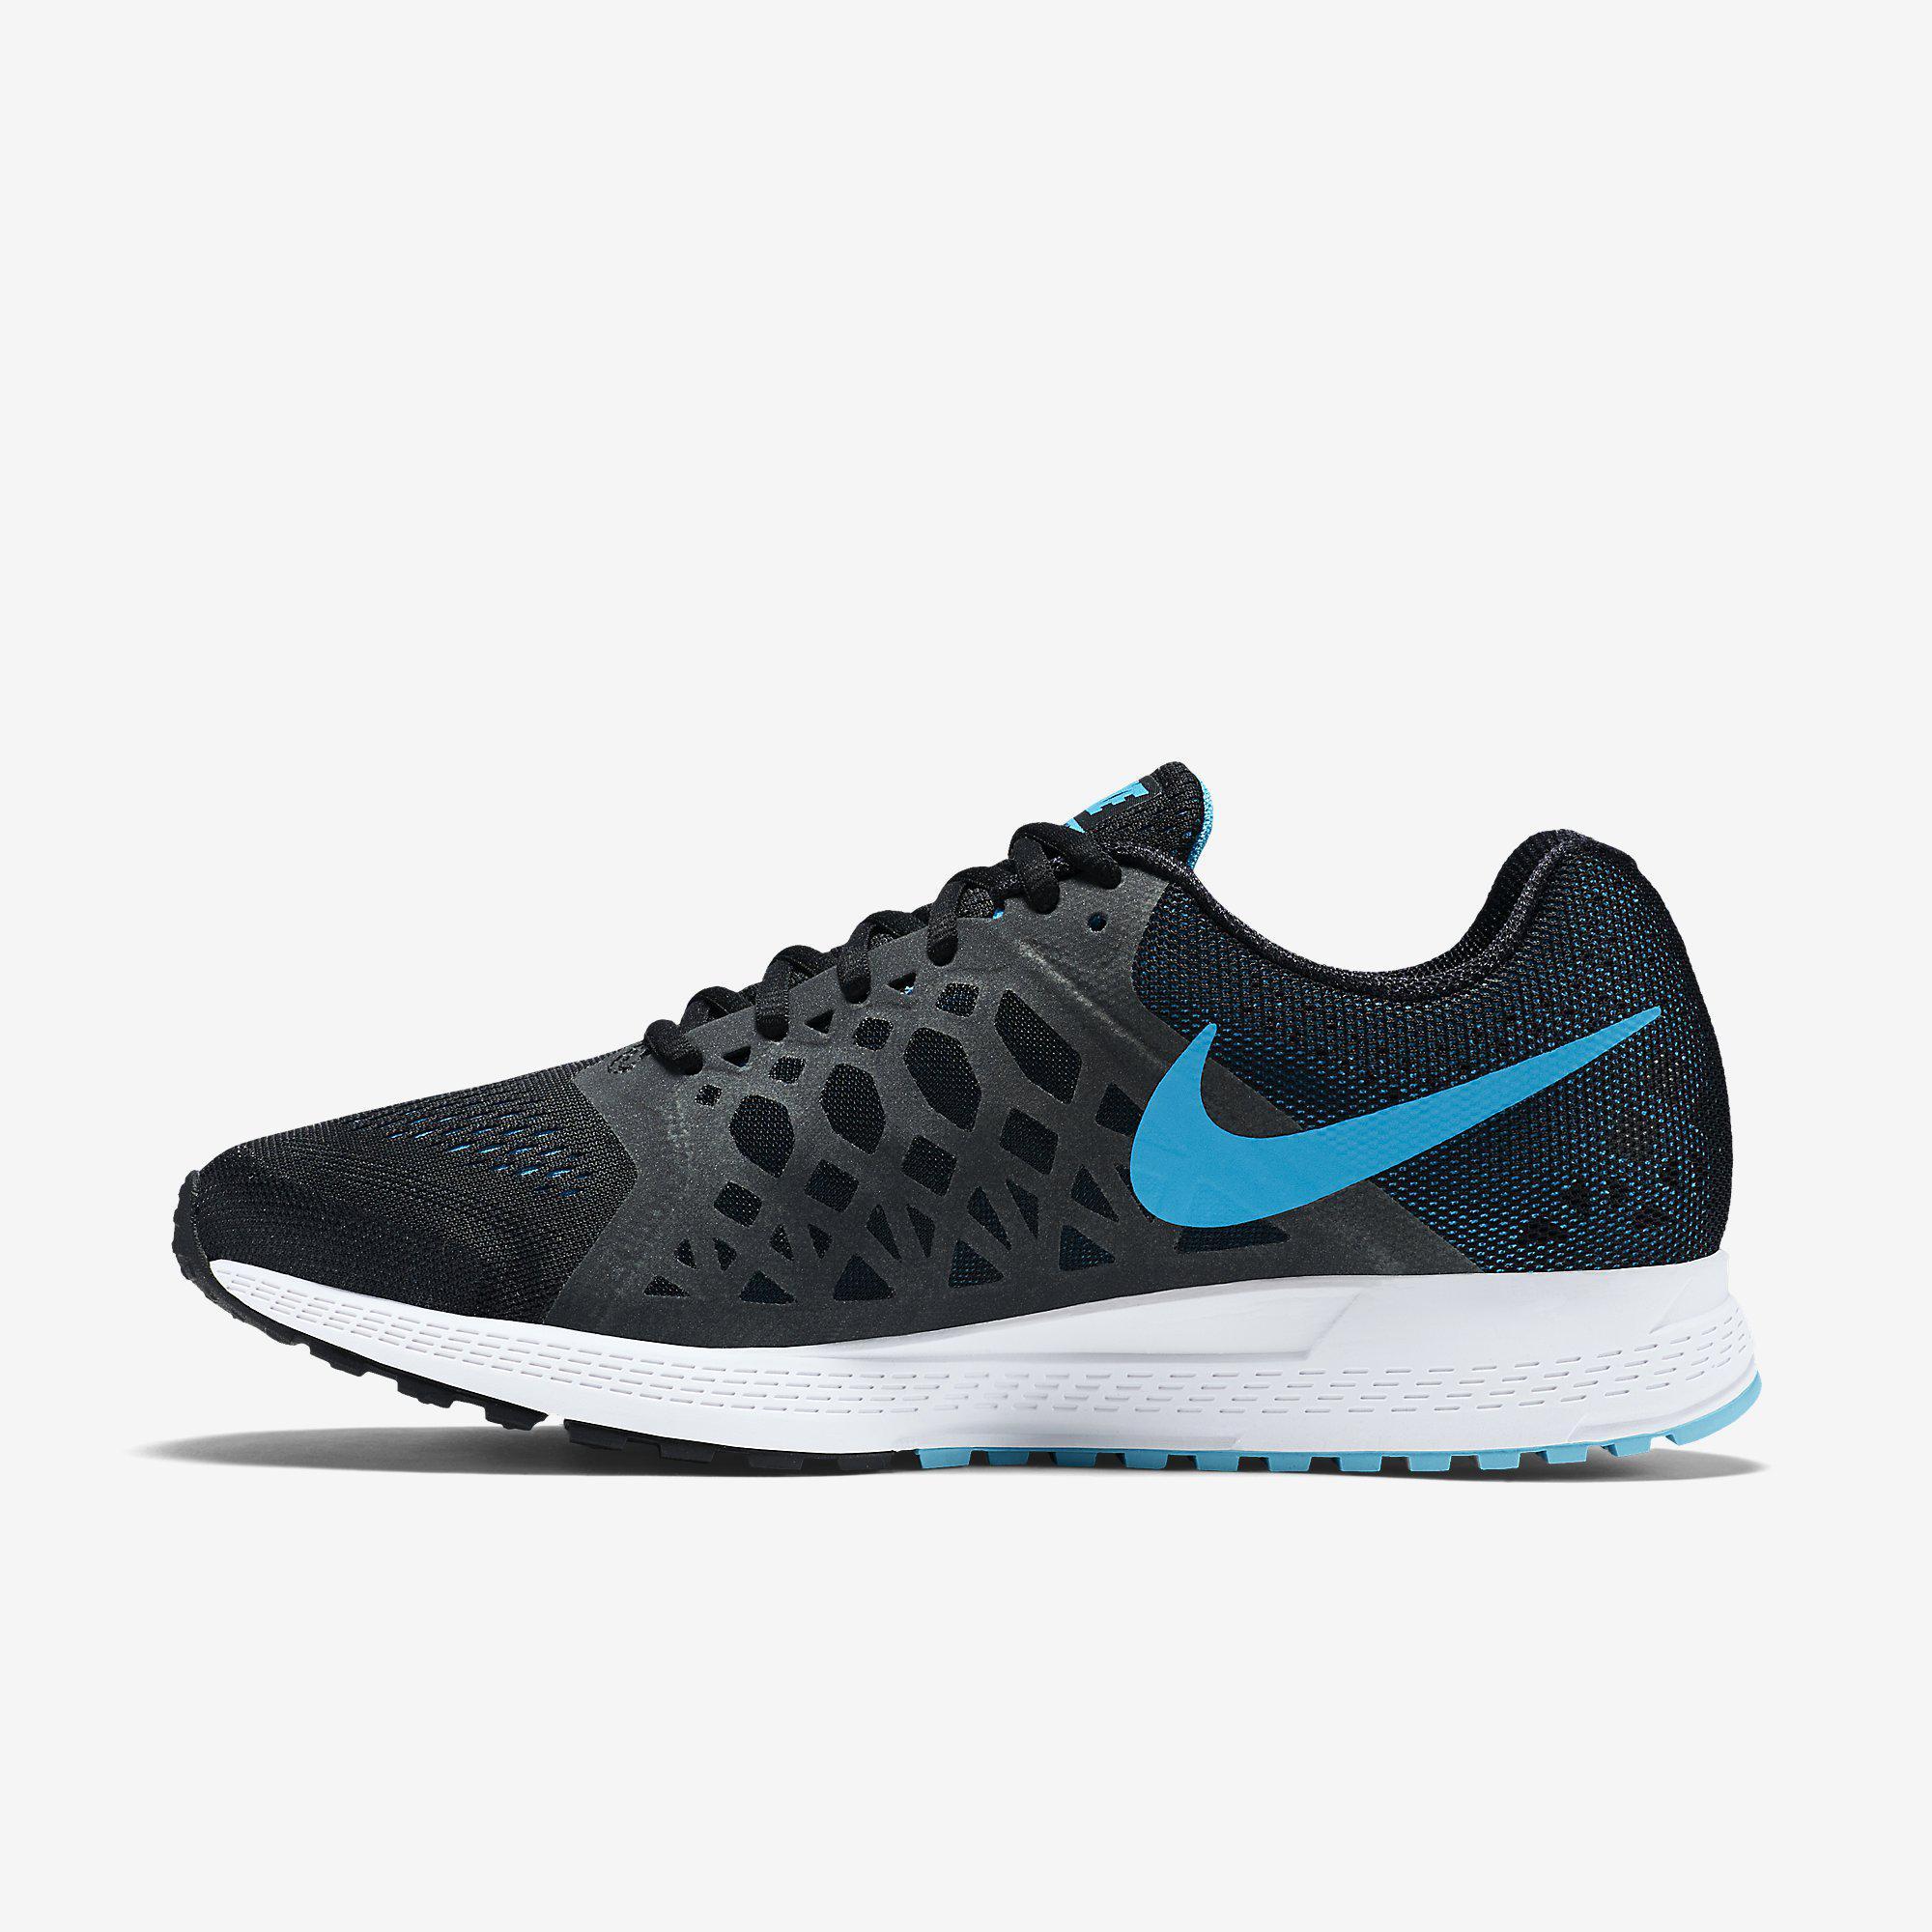 Nike Mens Air Zoom Pegasus+31 Running Shoes - Black White Blue ... 71095caa4